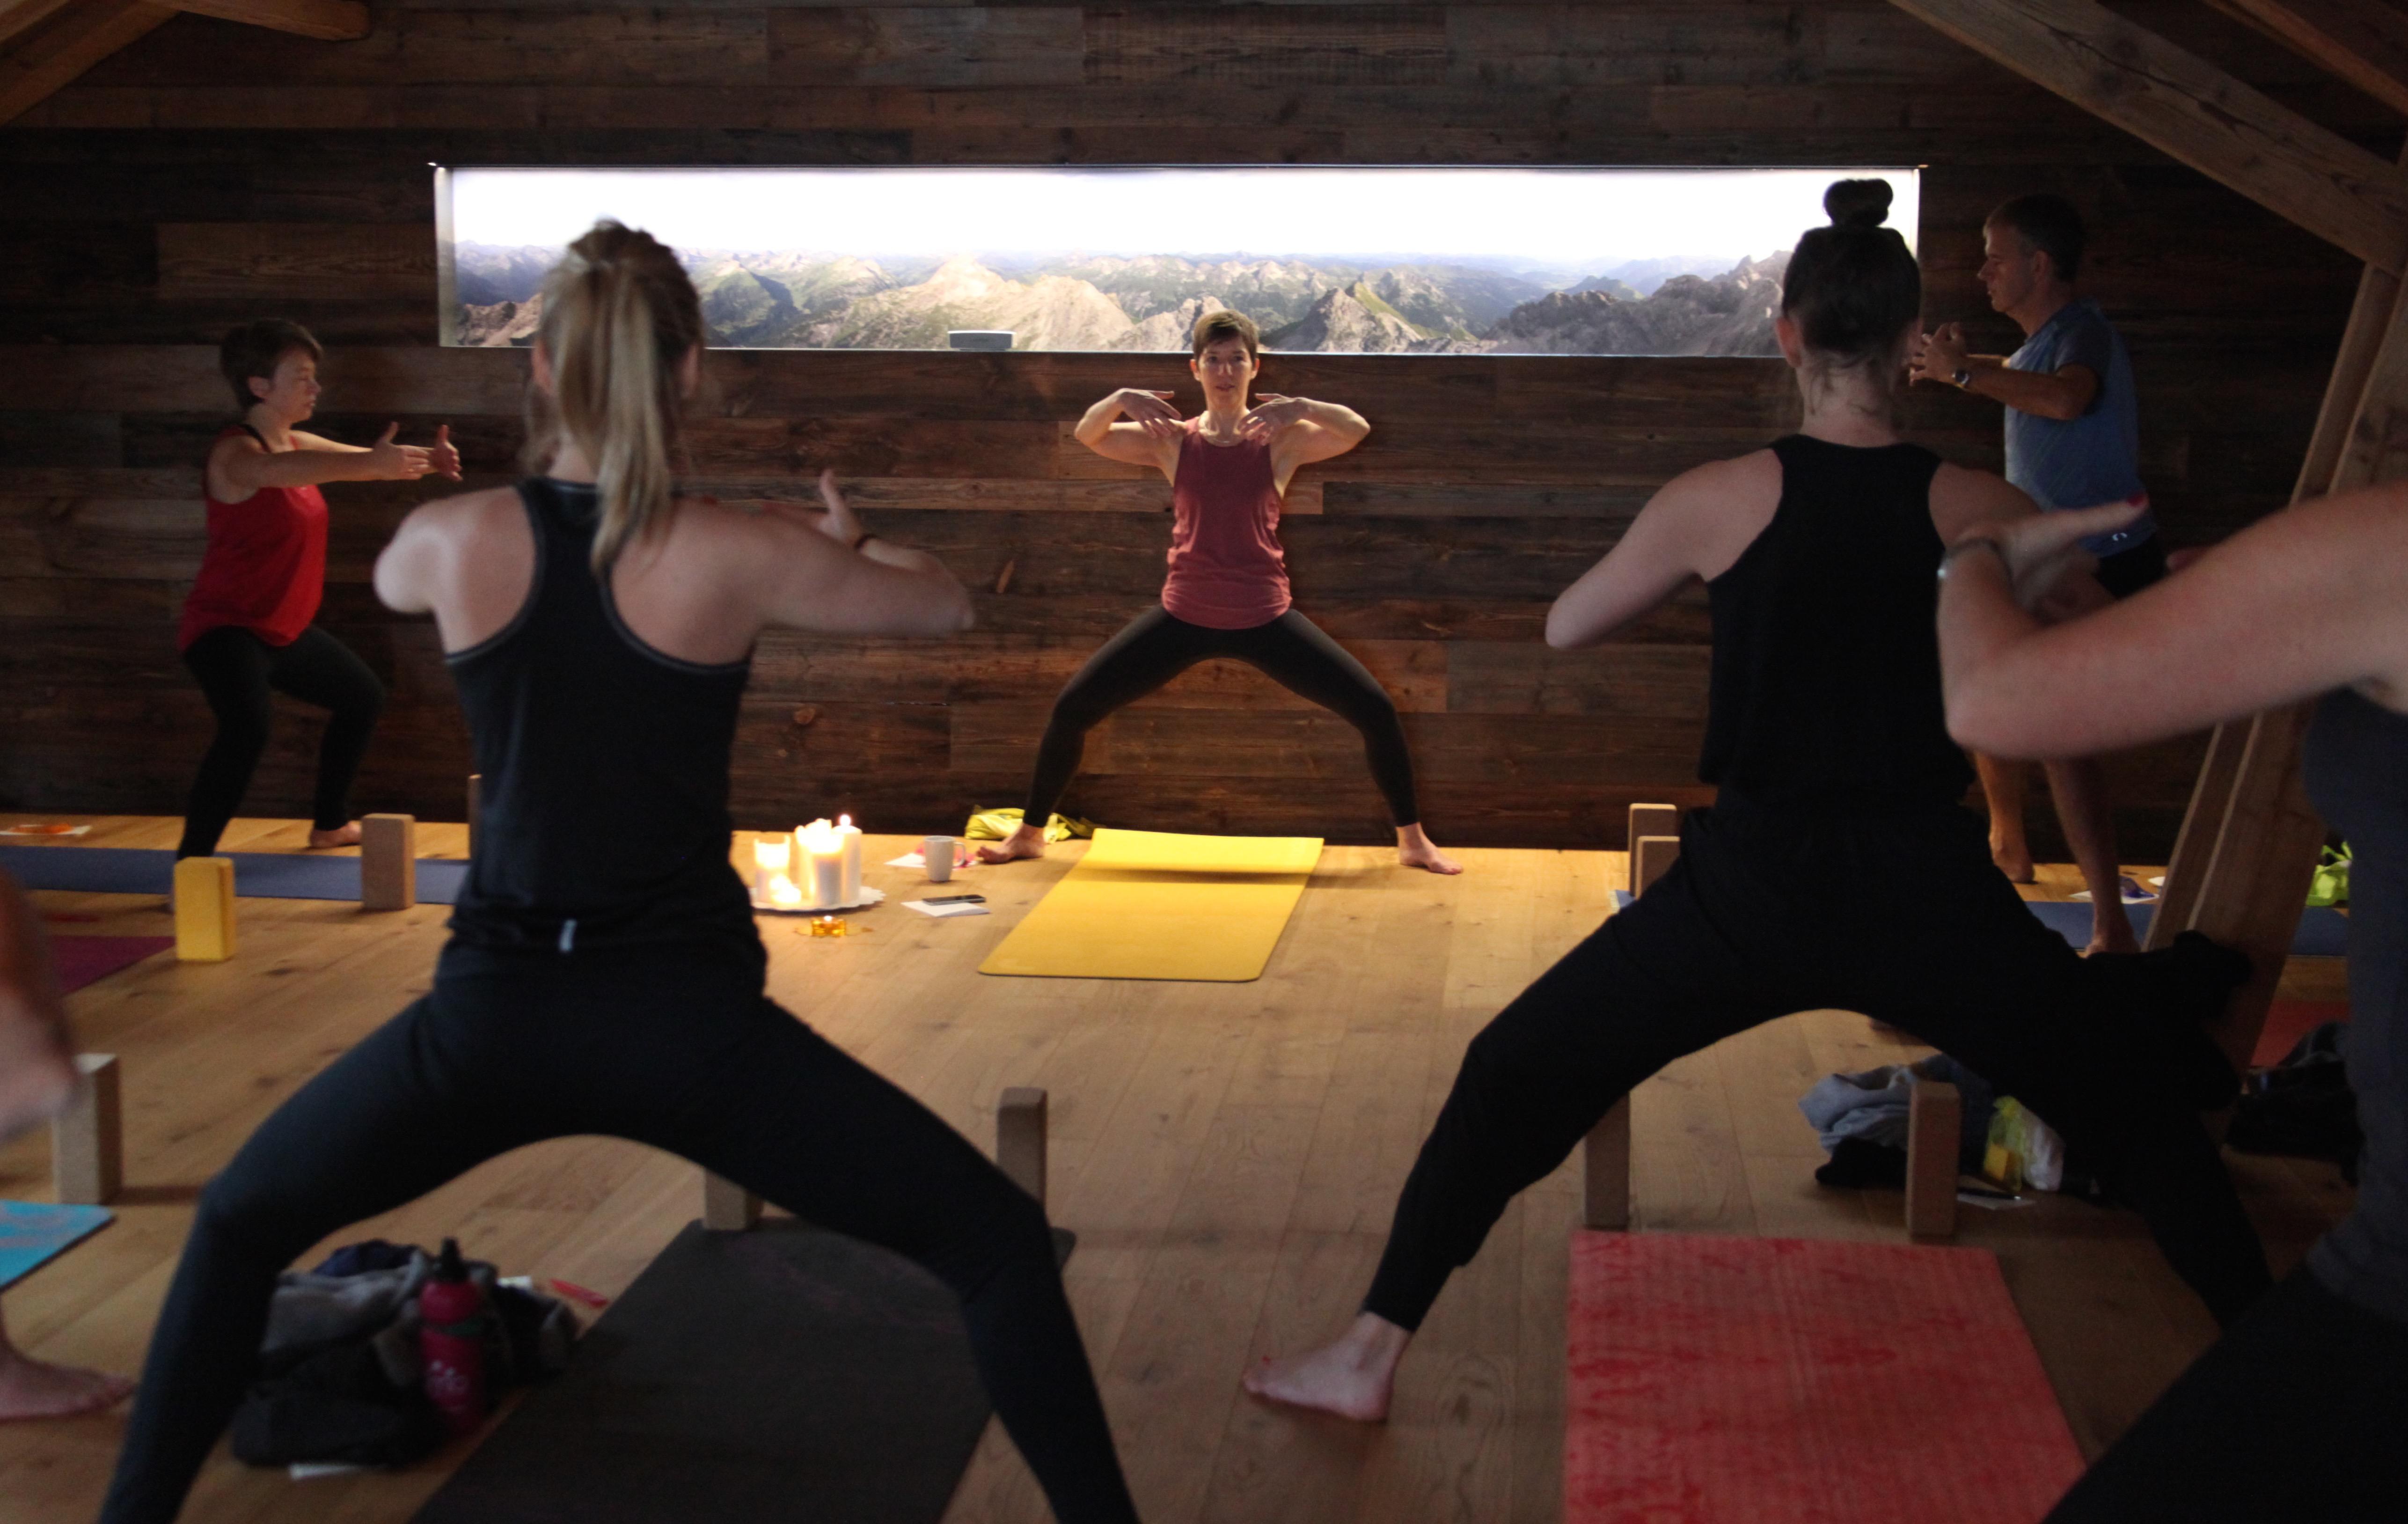 Yogaübung in der Gruppe